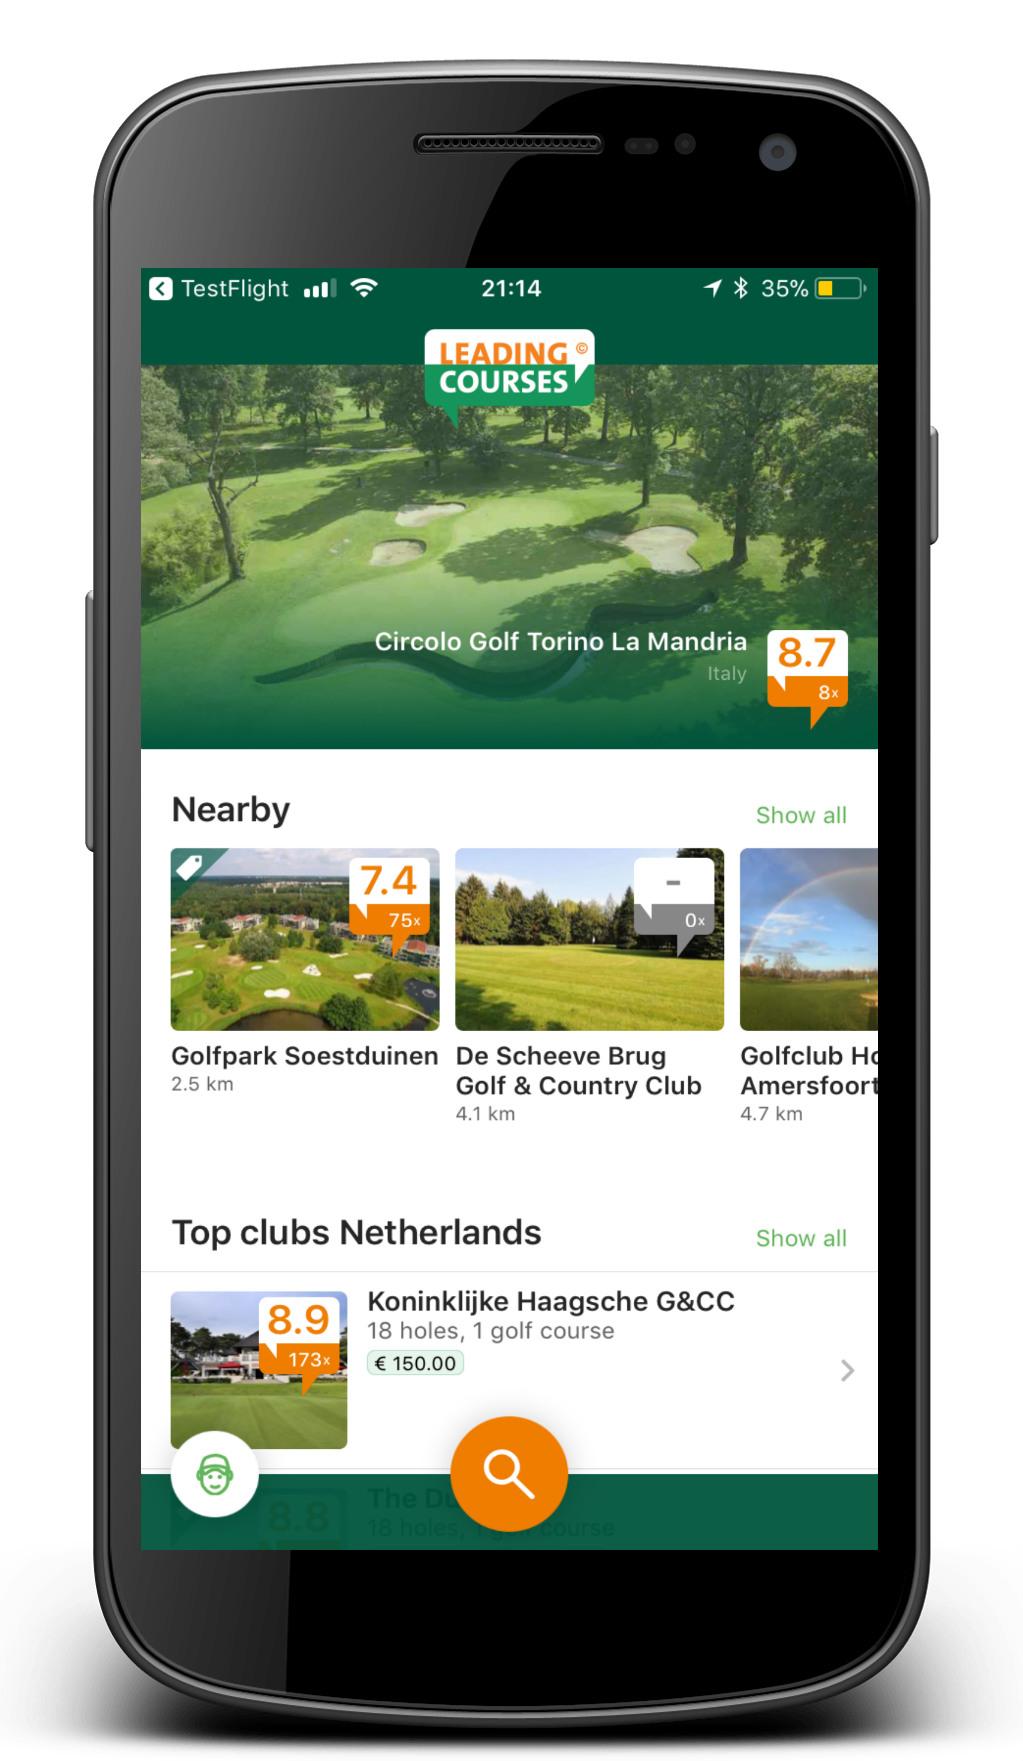 Pin High - Leadingcourses.com app